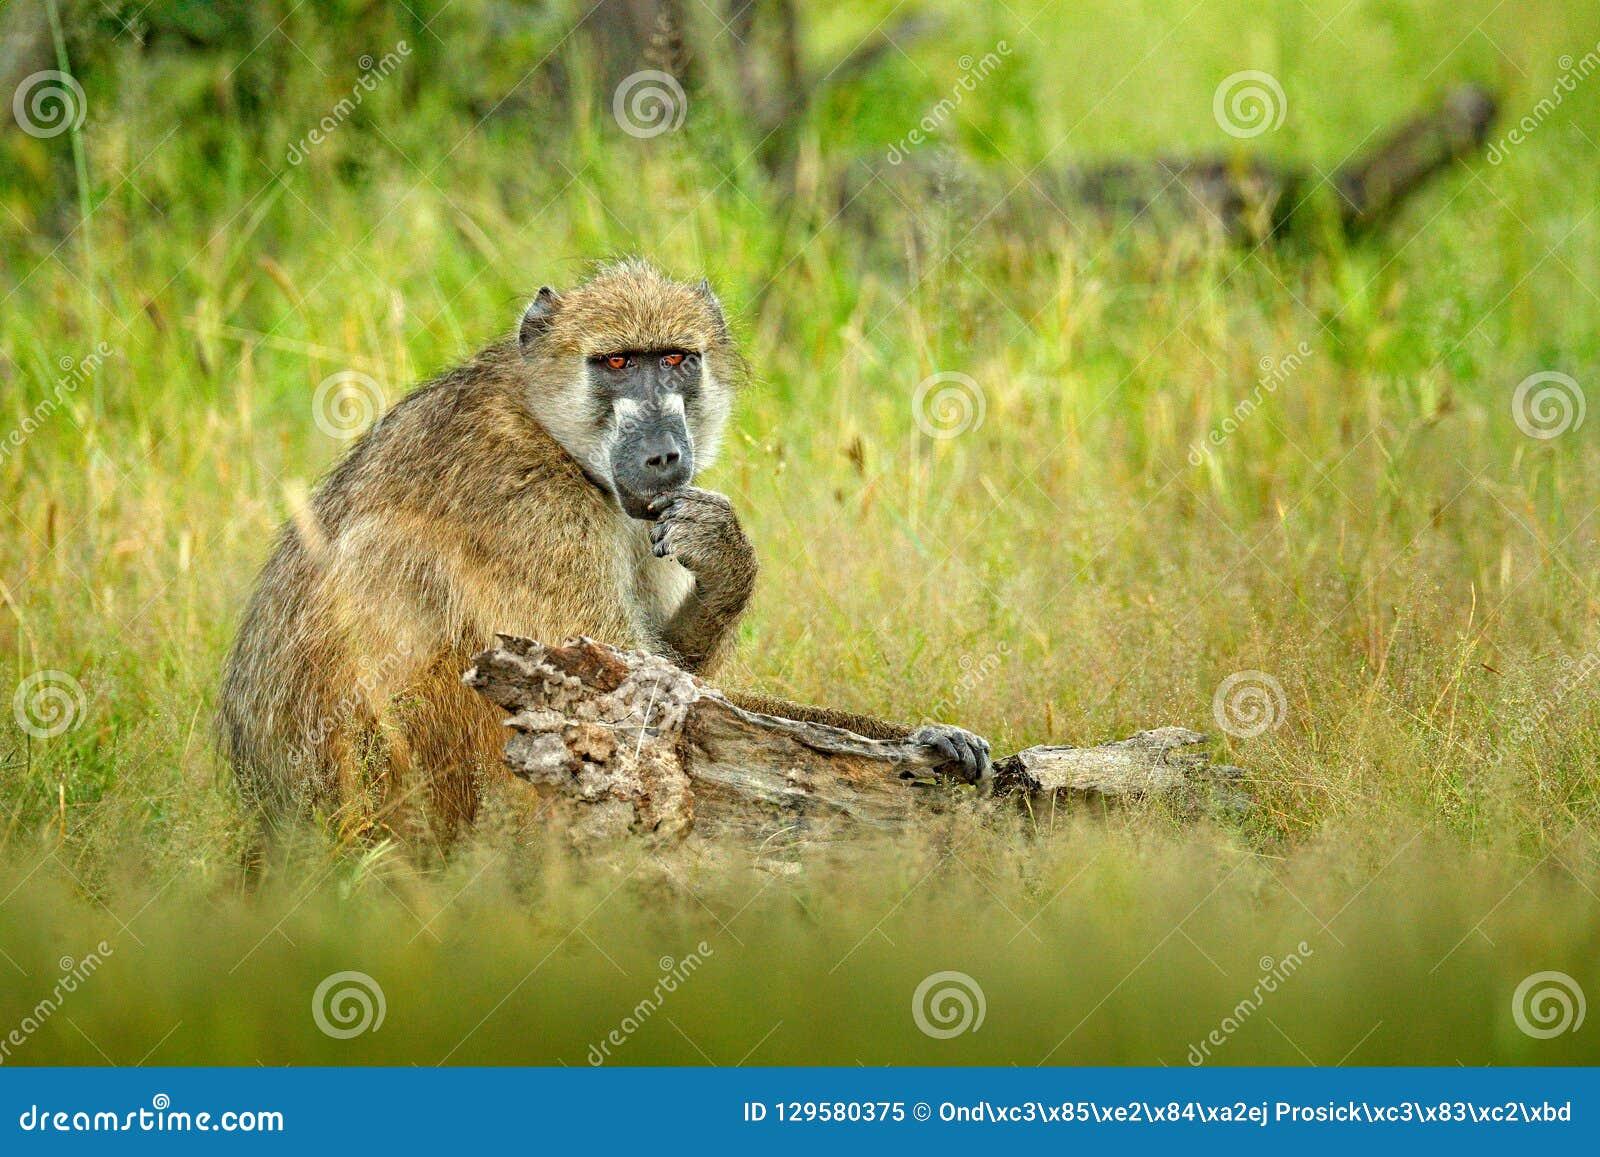 Chacma baboon, Papio ursinus, monkey from Moremi, Okavango delta, Botswana. Wild mammal in the nature habitat. Monkey feeding frui